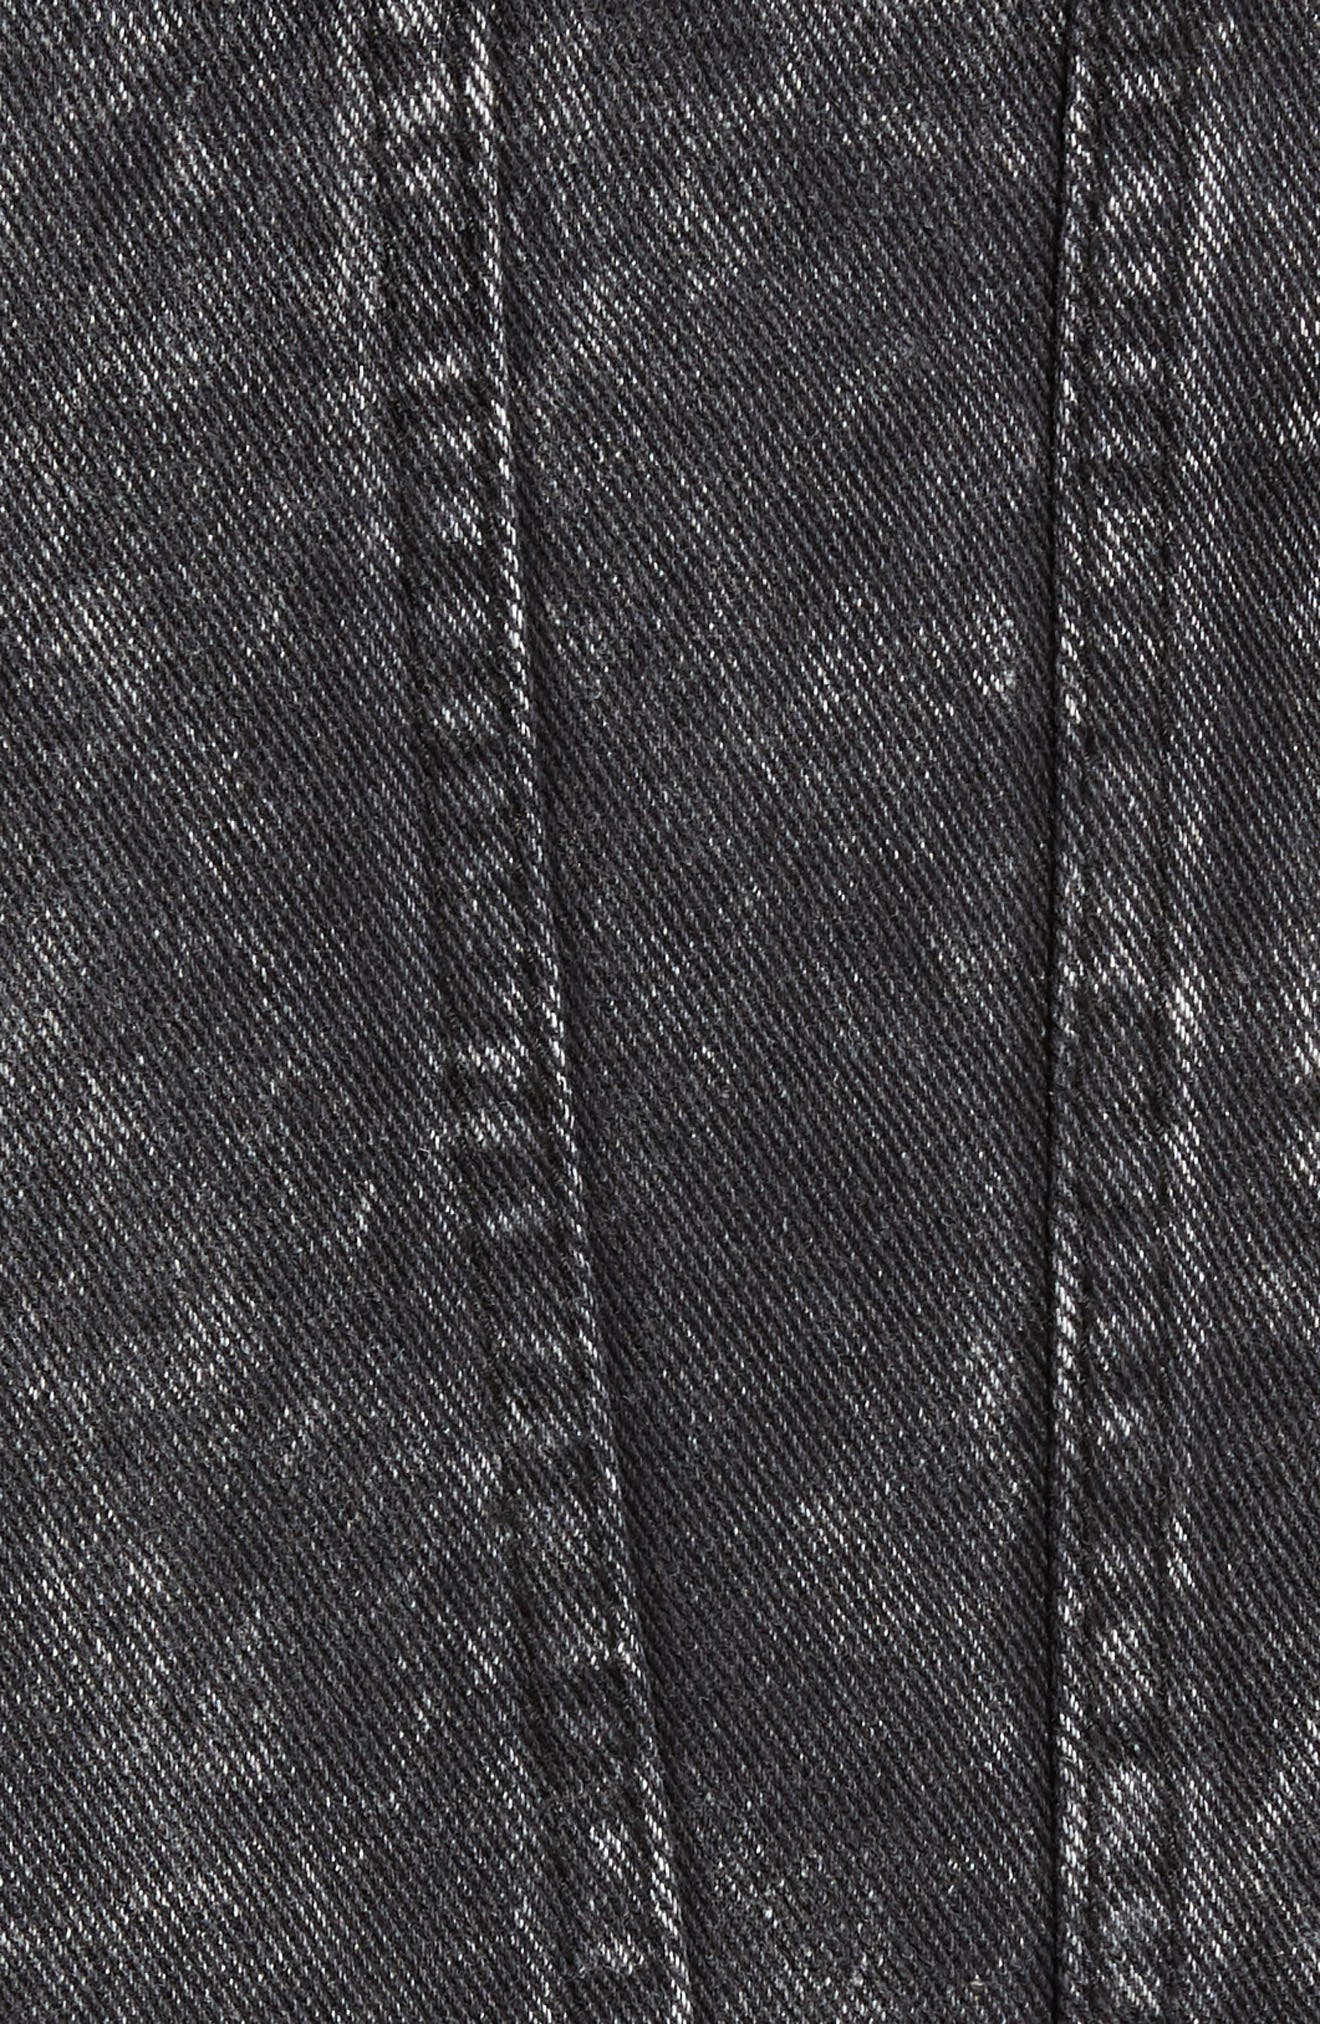 Billy Joel At the Garden Denim Jacket,                             Alternate thumbnail 6, color,                             BLACK ACID